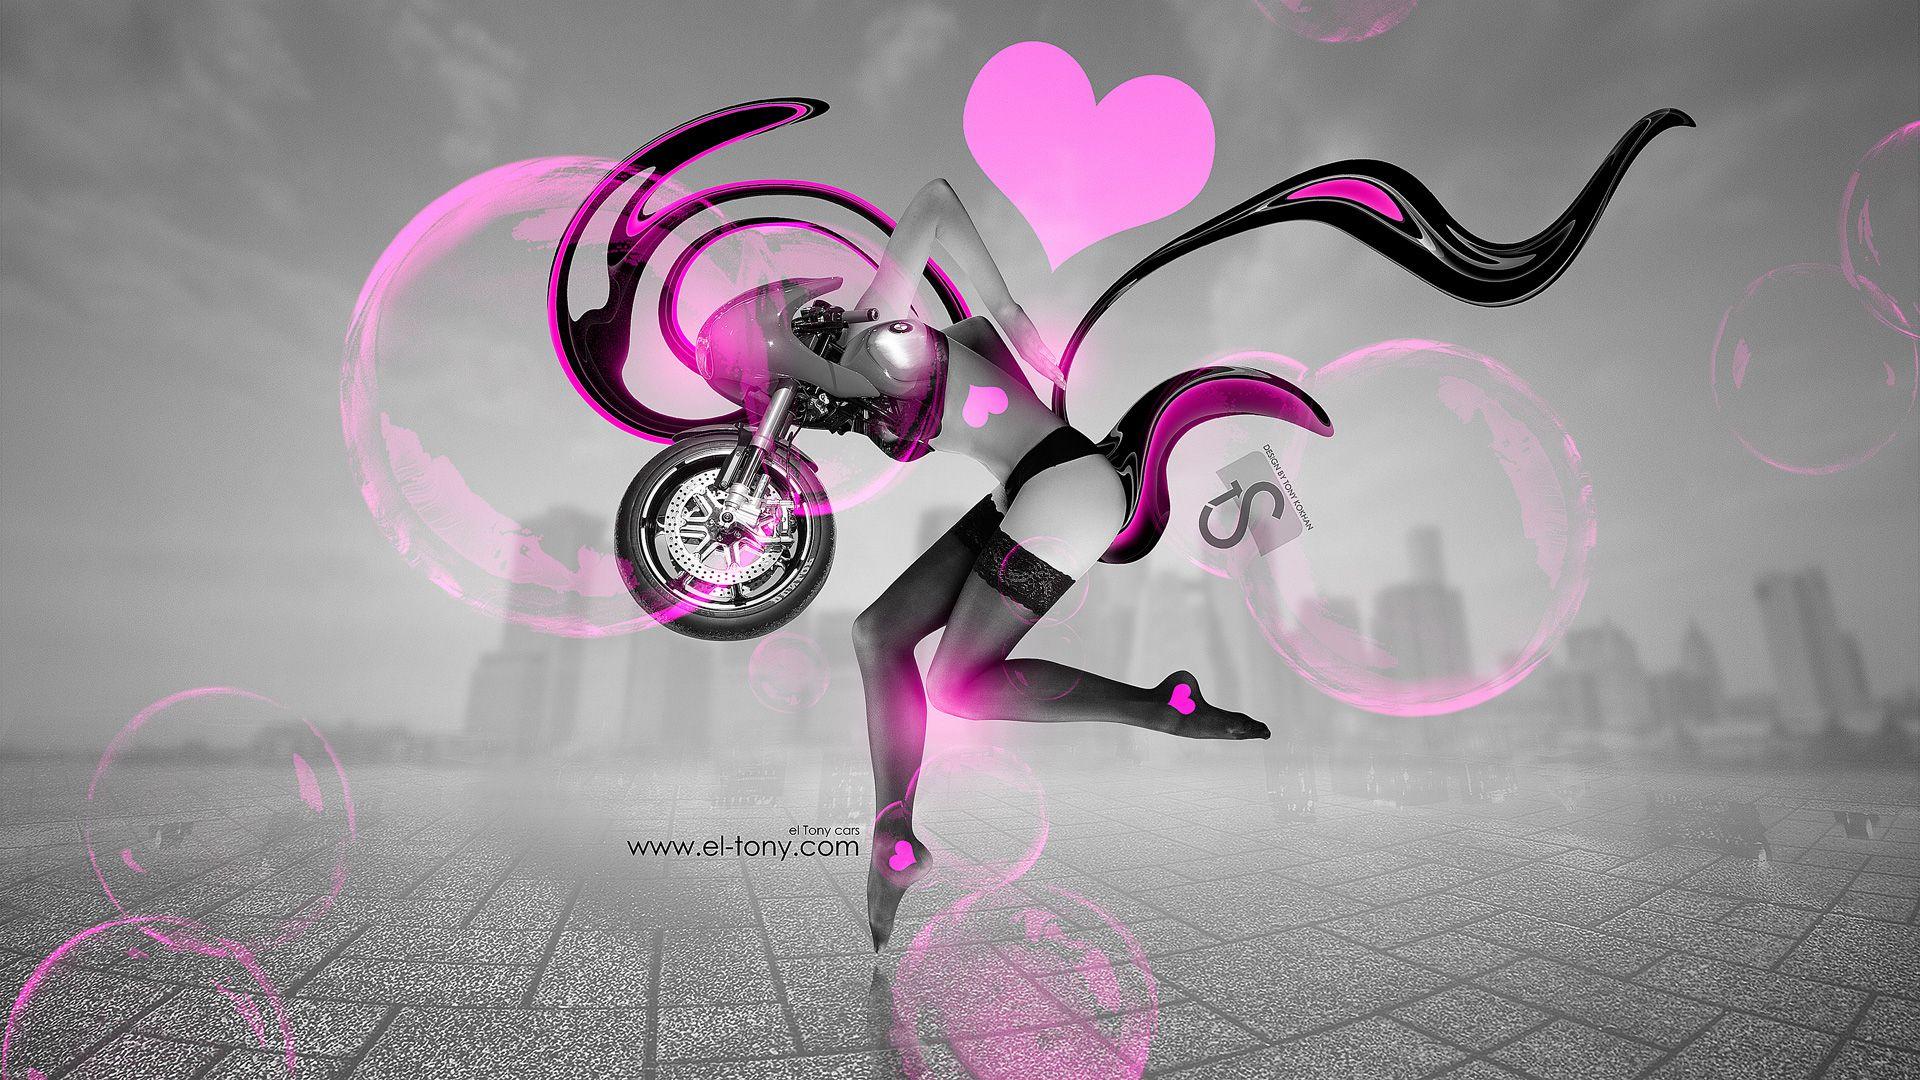 Http://www.el Tony.com/wp Content/uploads/2014/01/Moto BMW R90S Fantasy  Sexy Girl 2014 Pink Neon HD Wallpapers Design By Tony Kokhan Www.el Tony.cou2026